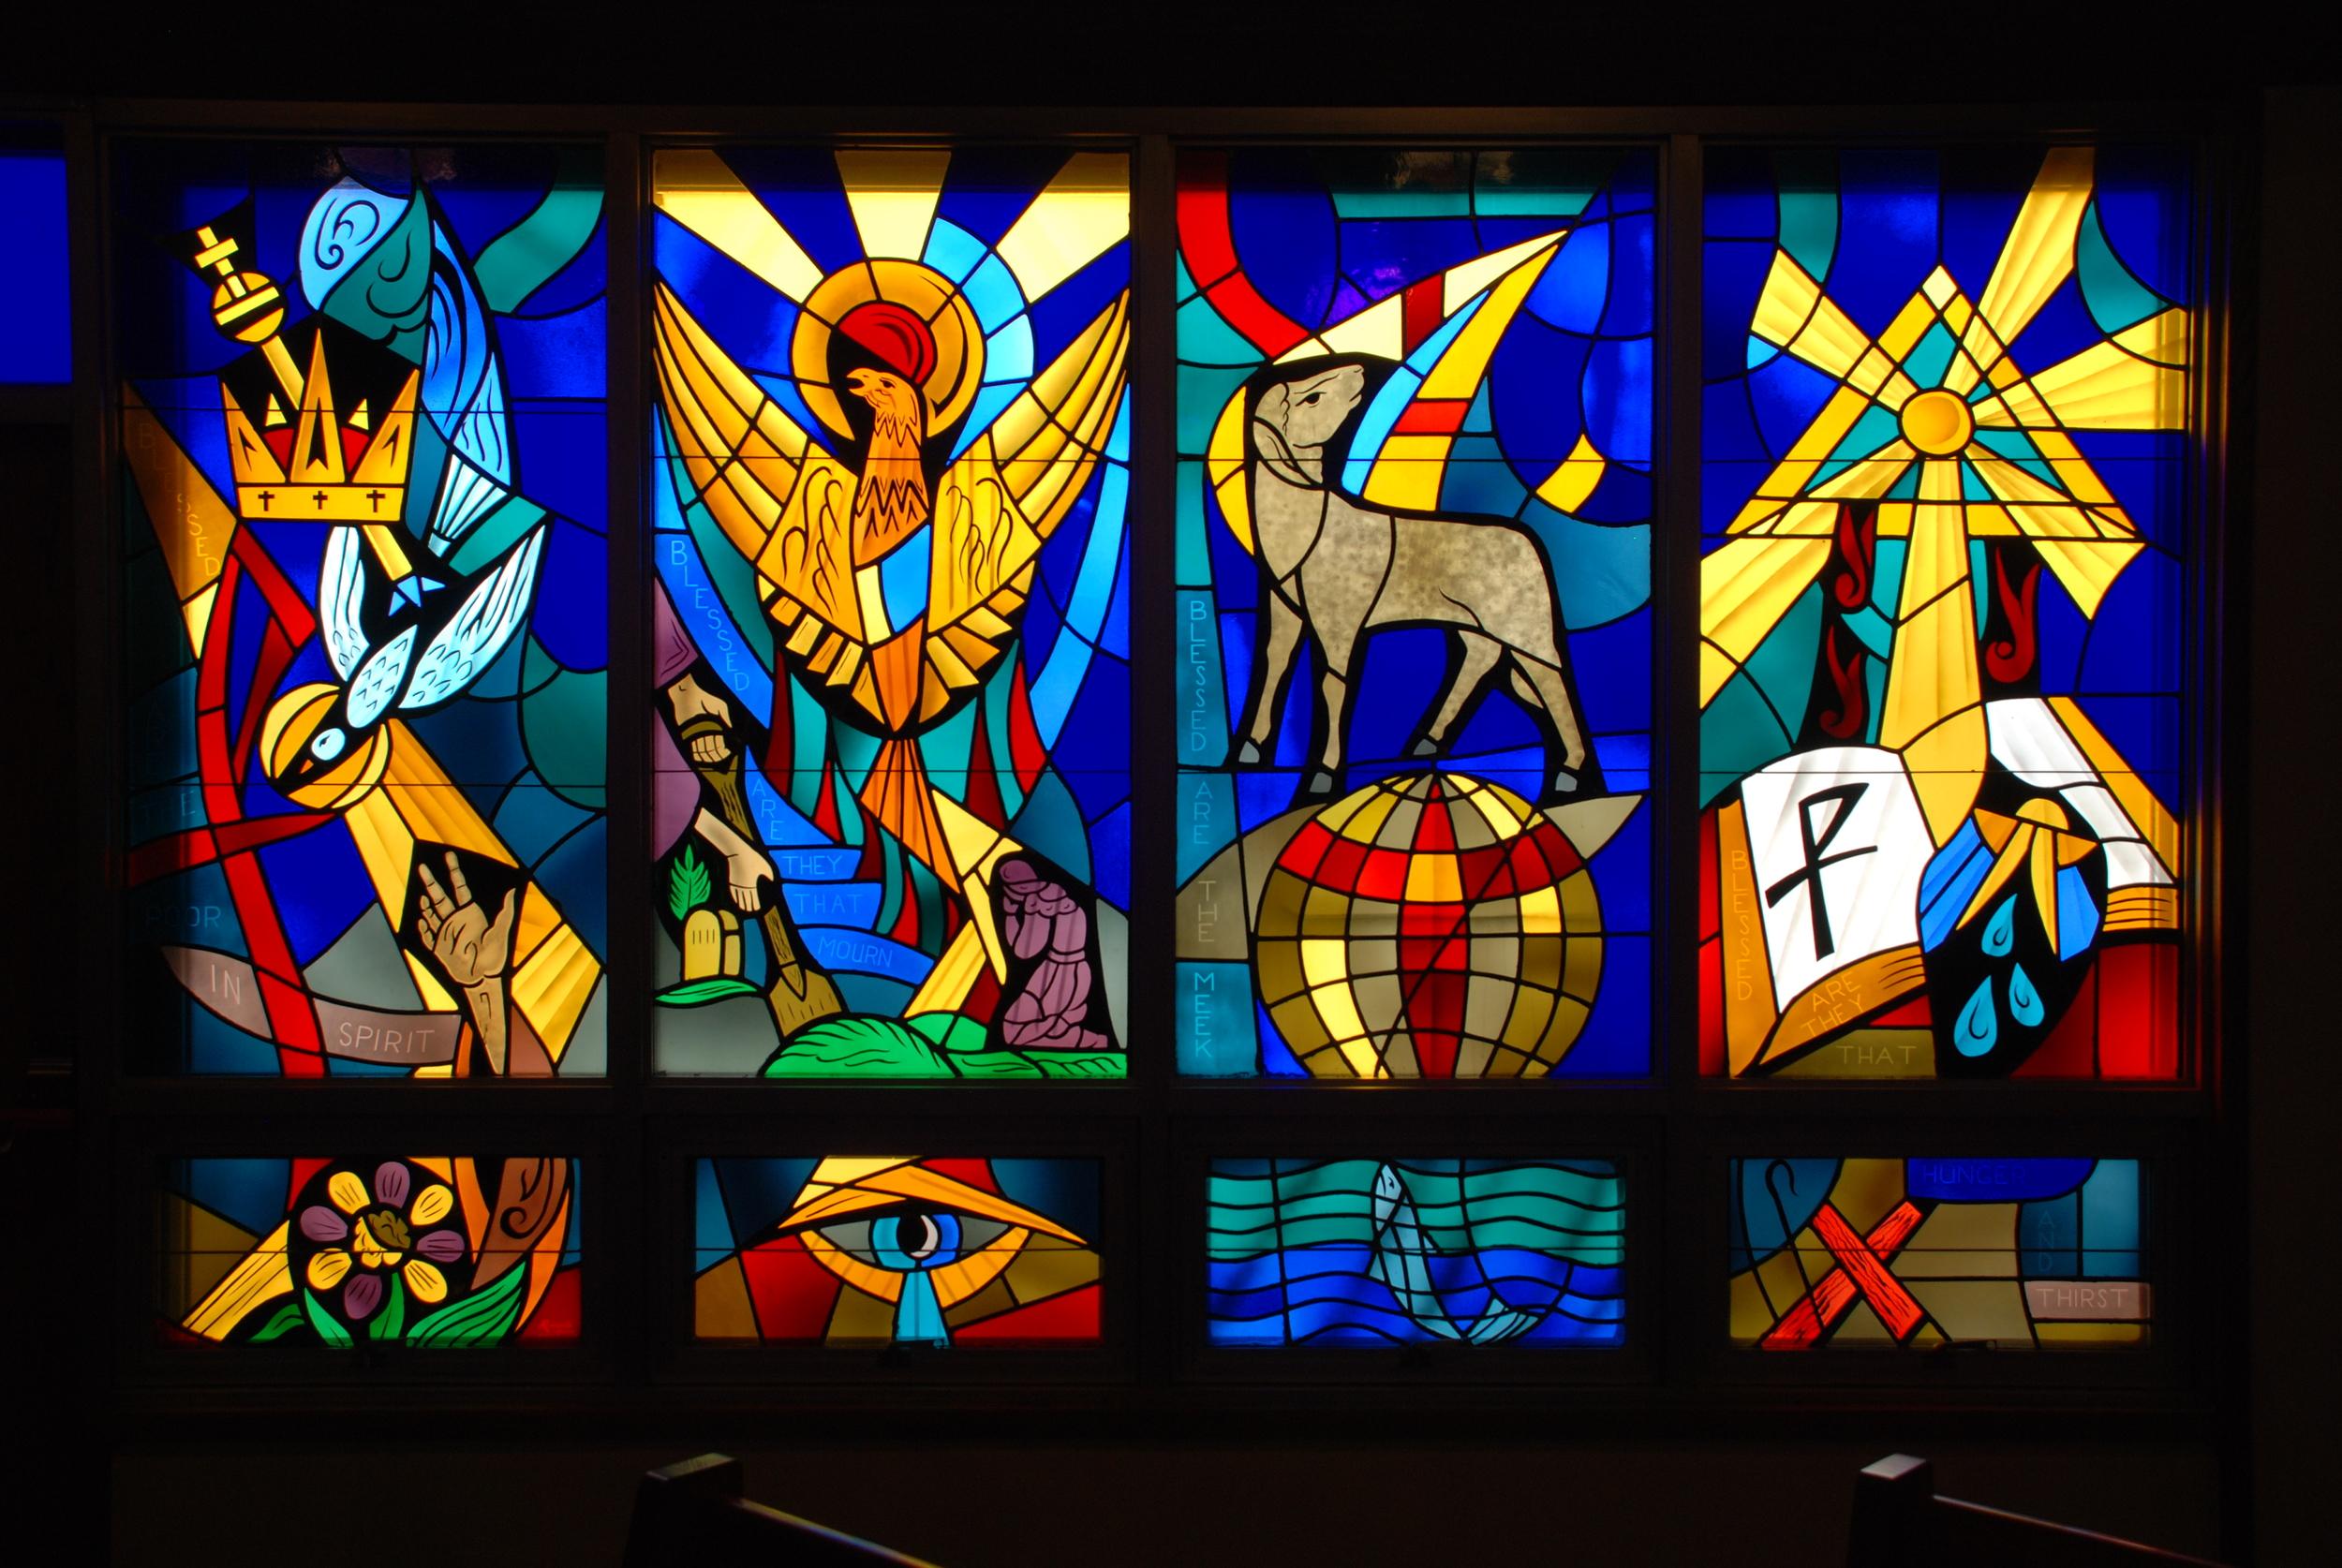 St Vincent DePaul - Seward, NE